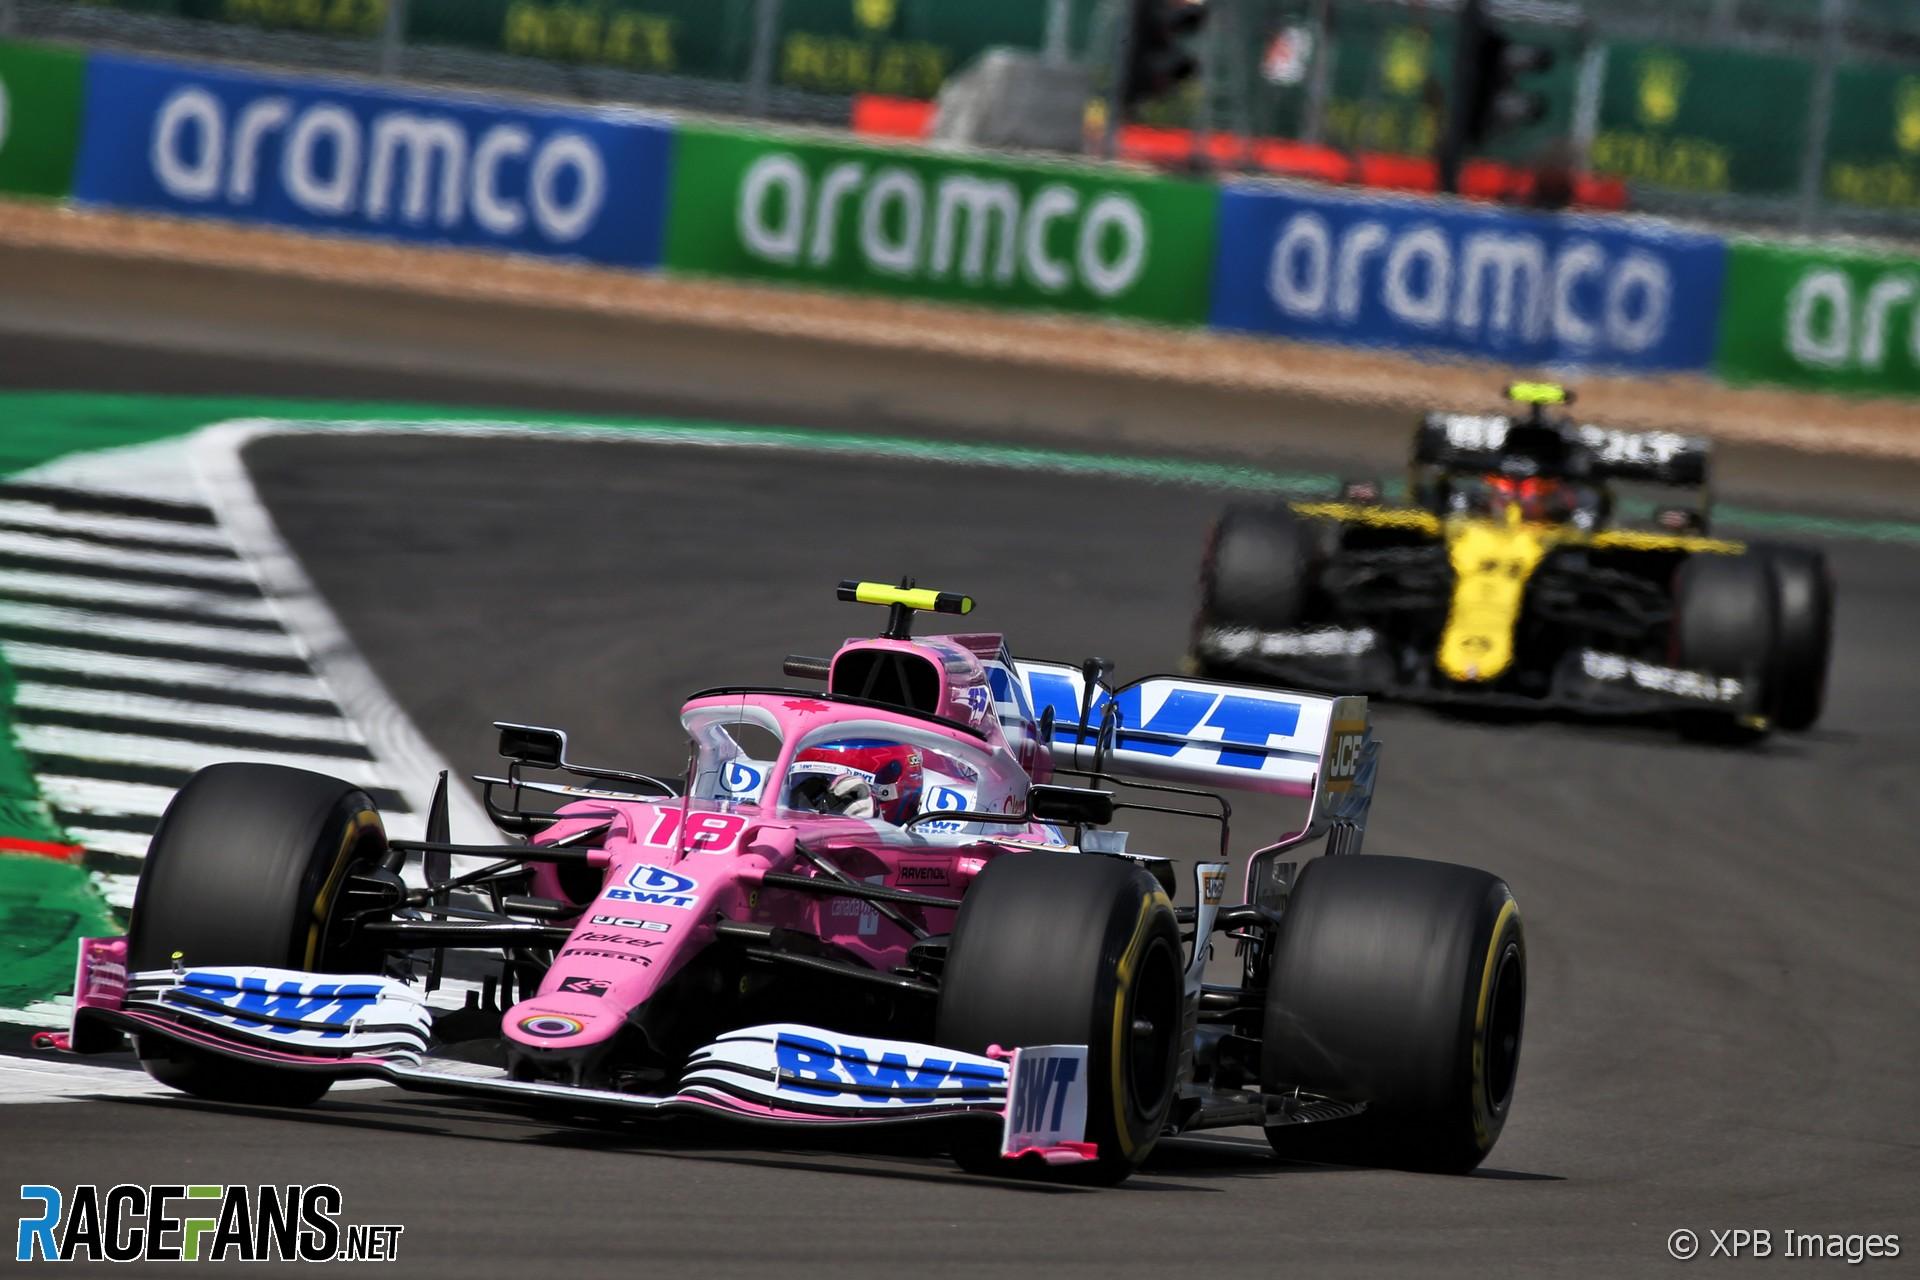 Lance Stroll, Racing Point, Silverstone, 2020